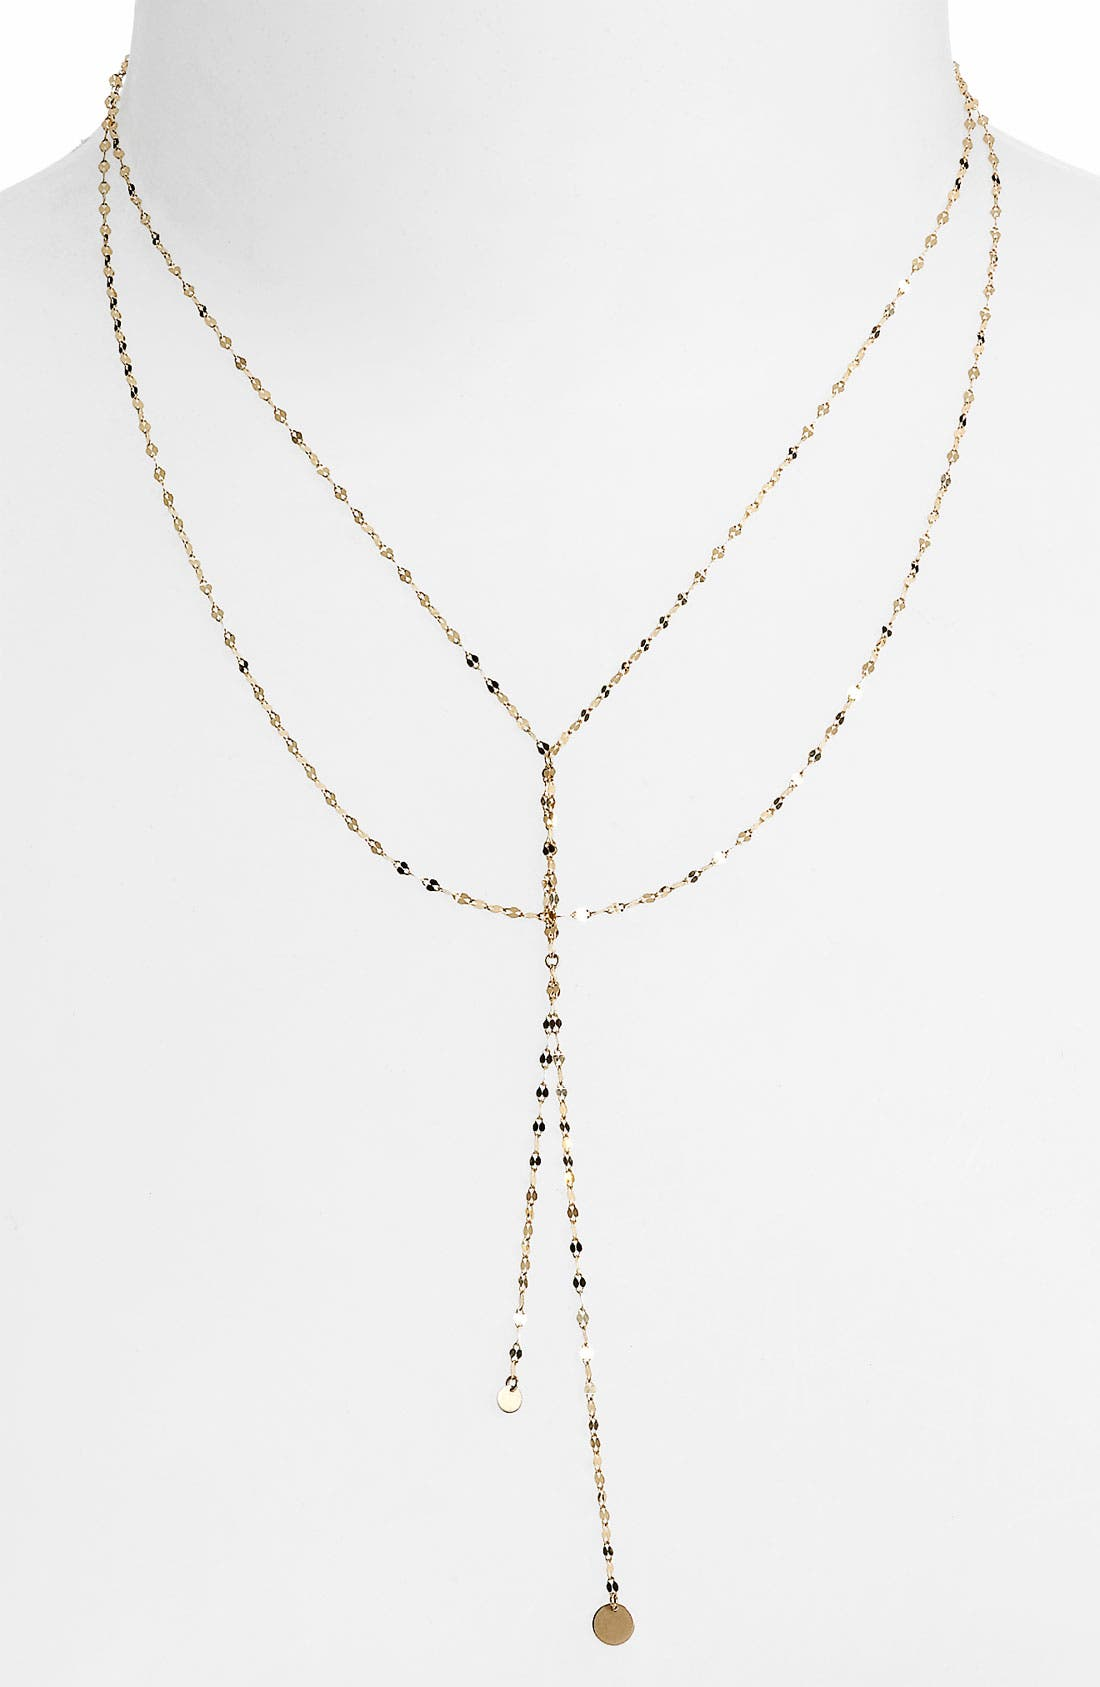 Lana Jewelry 'Petite Blake' Lariat Necklace